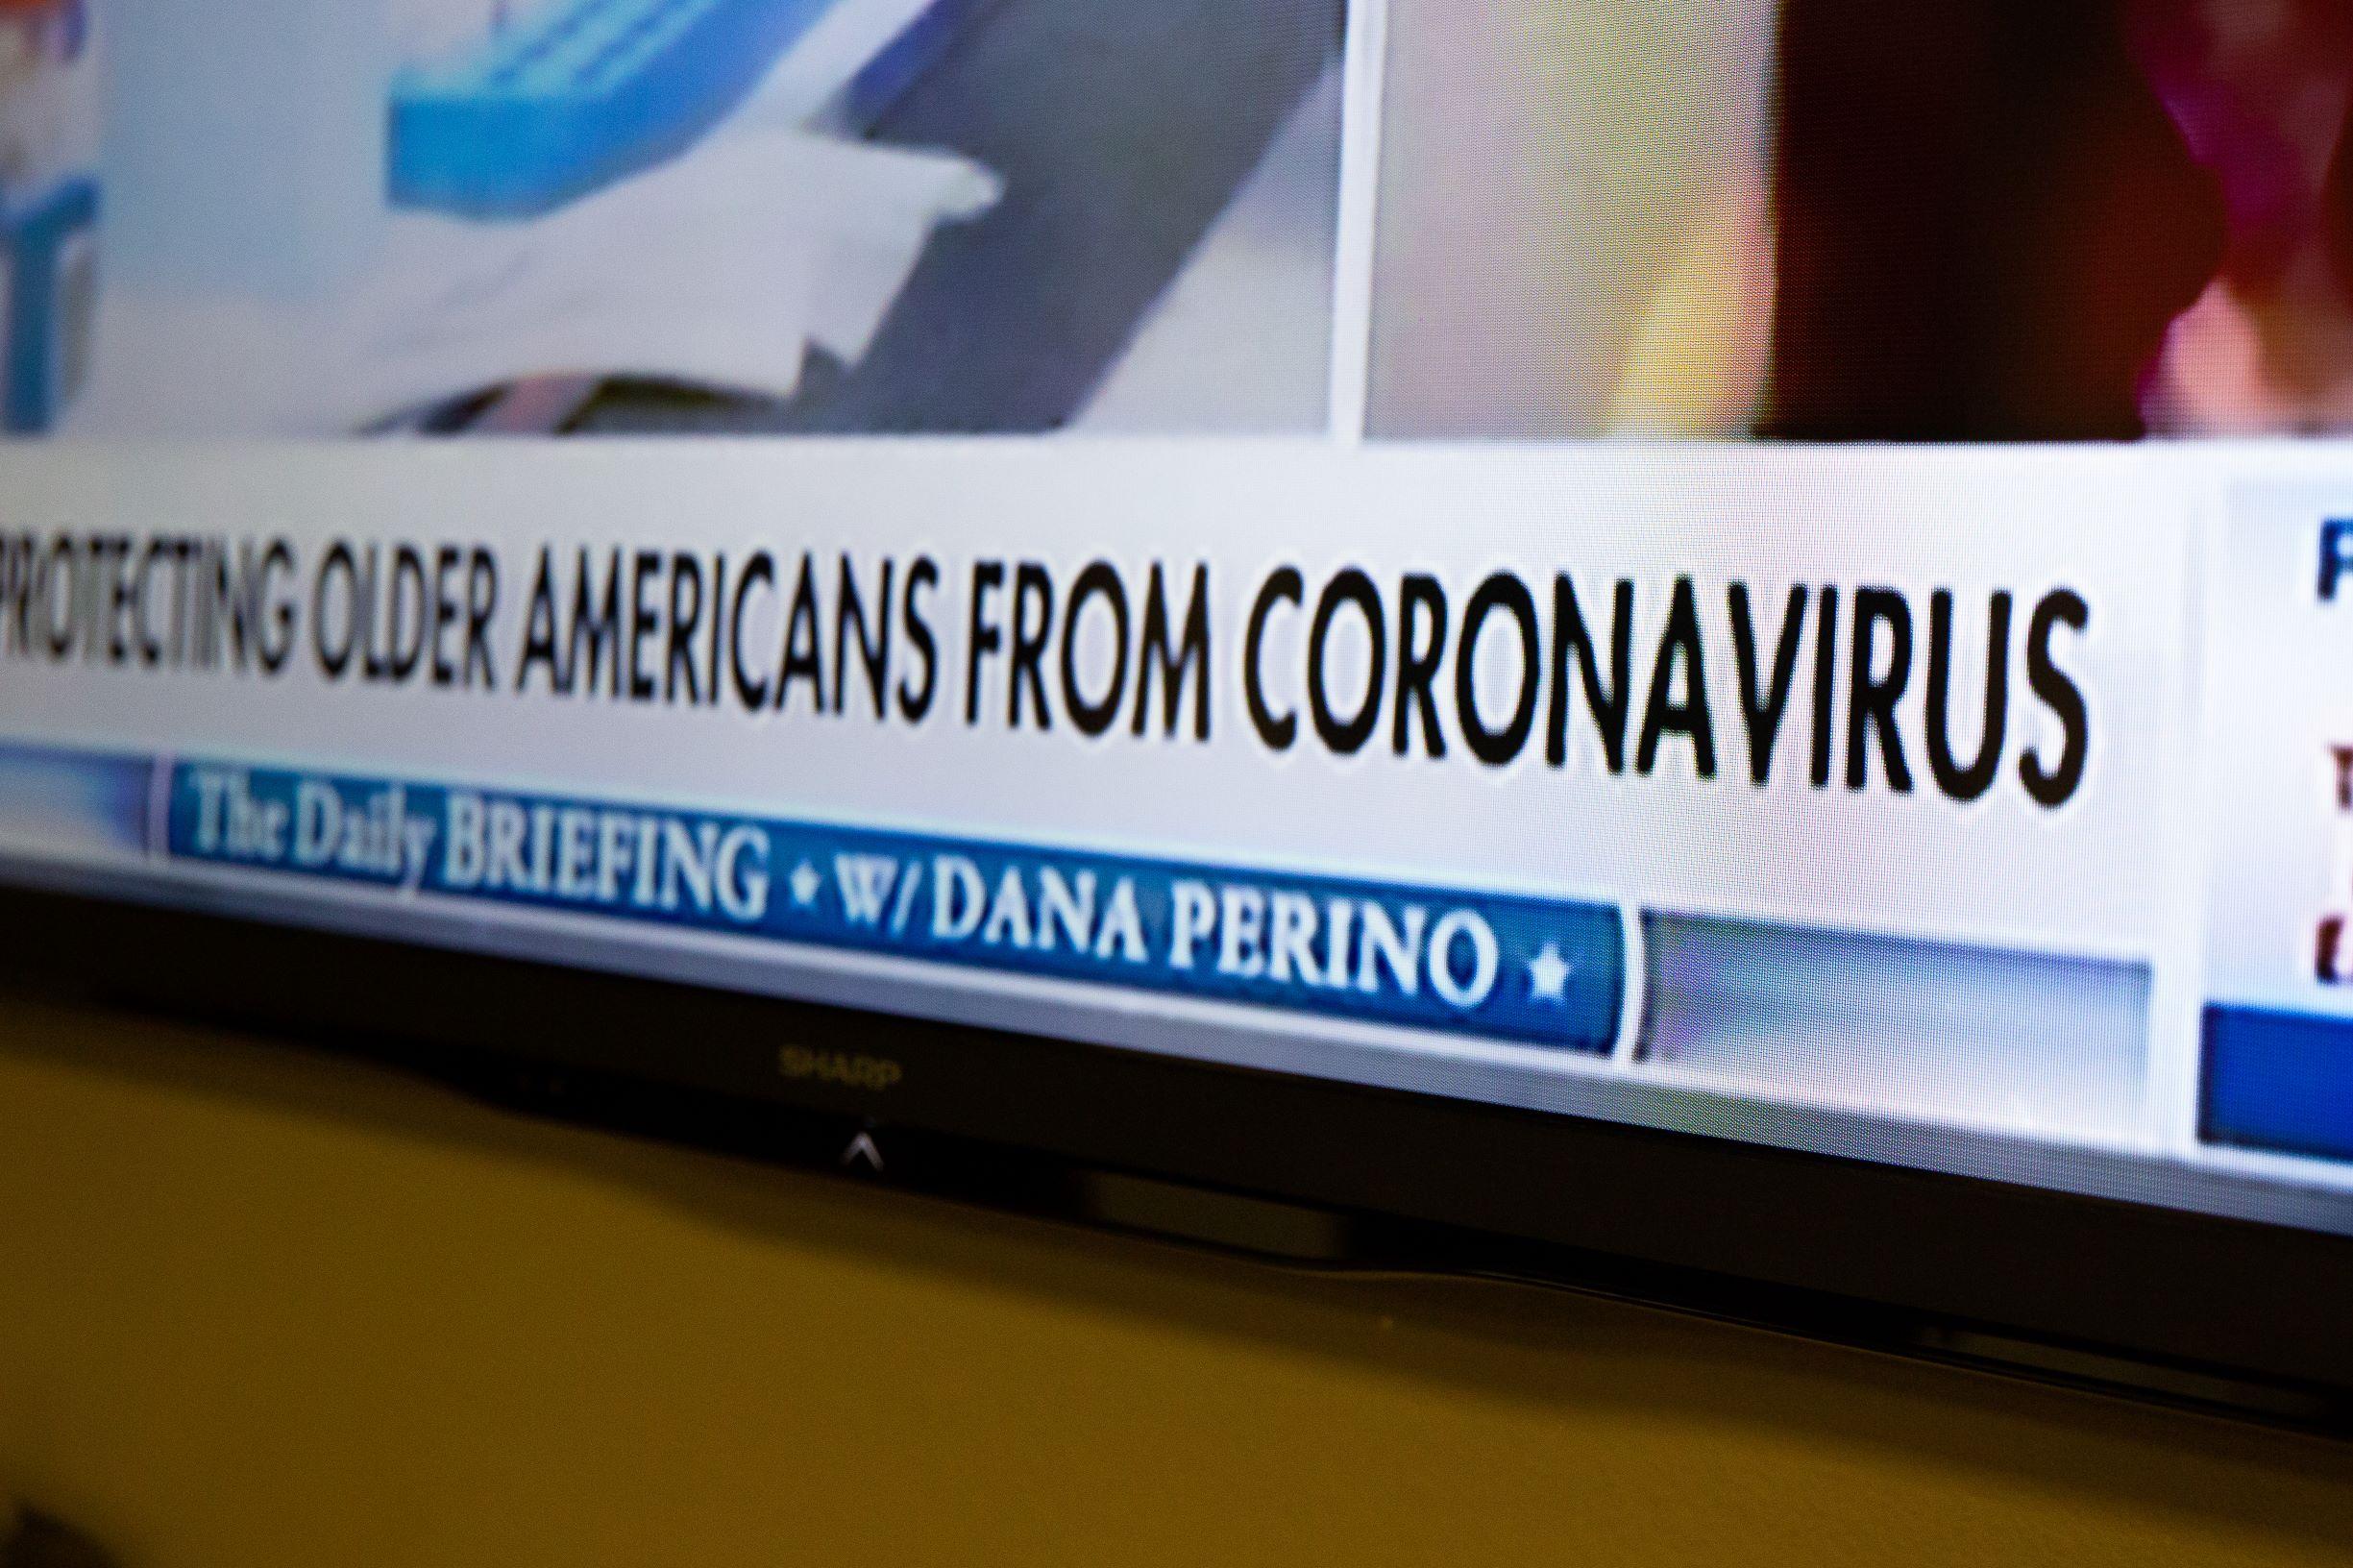 Fox News broadcast